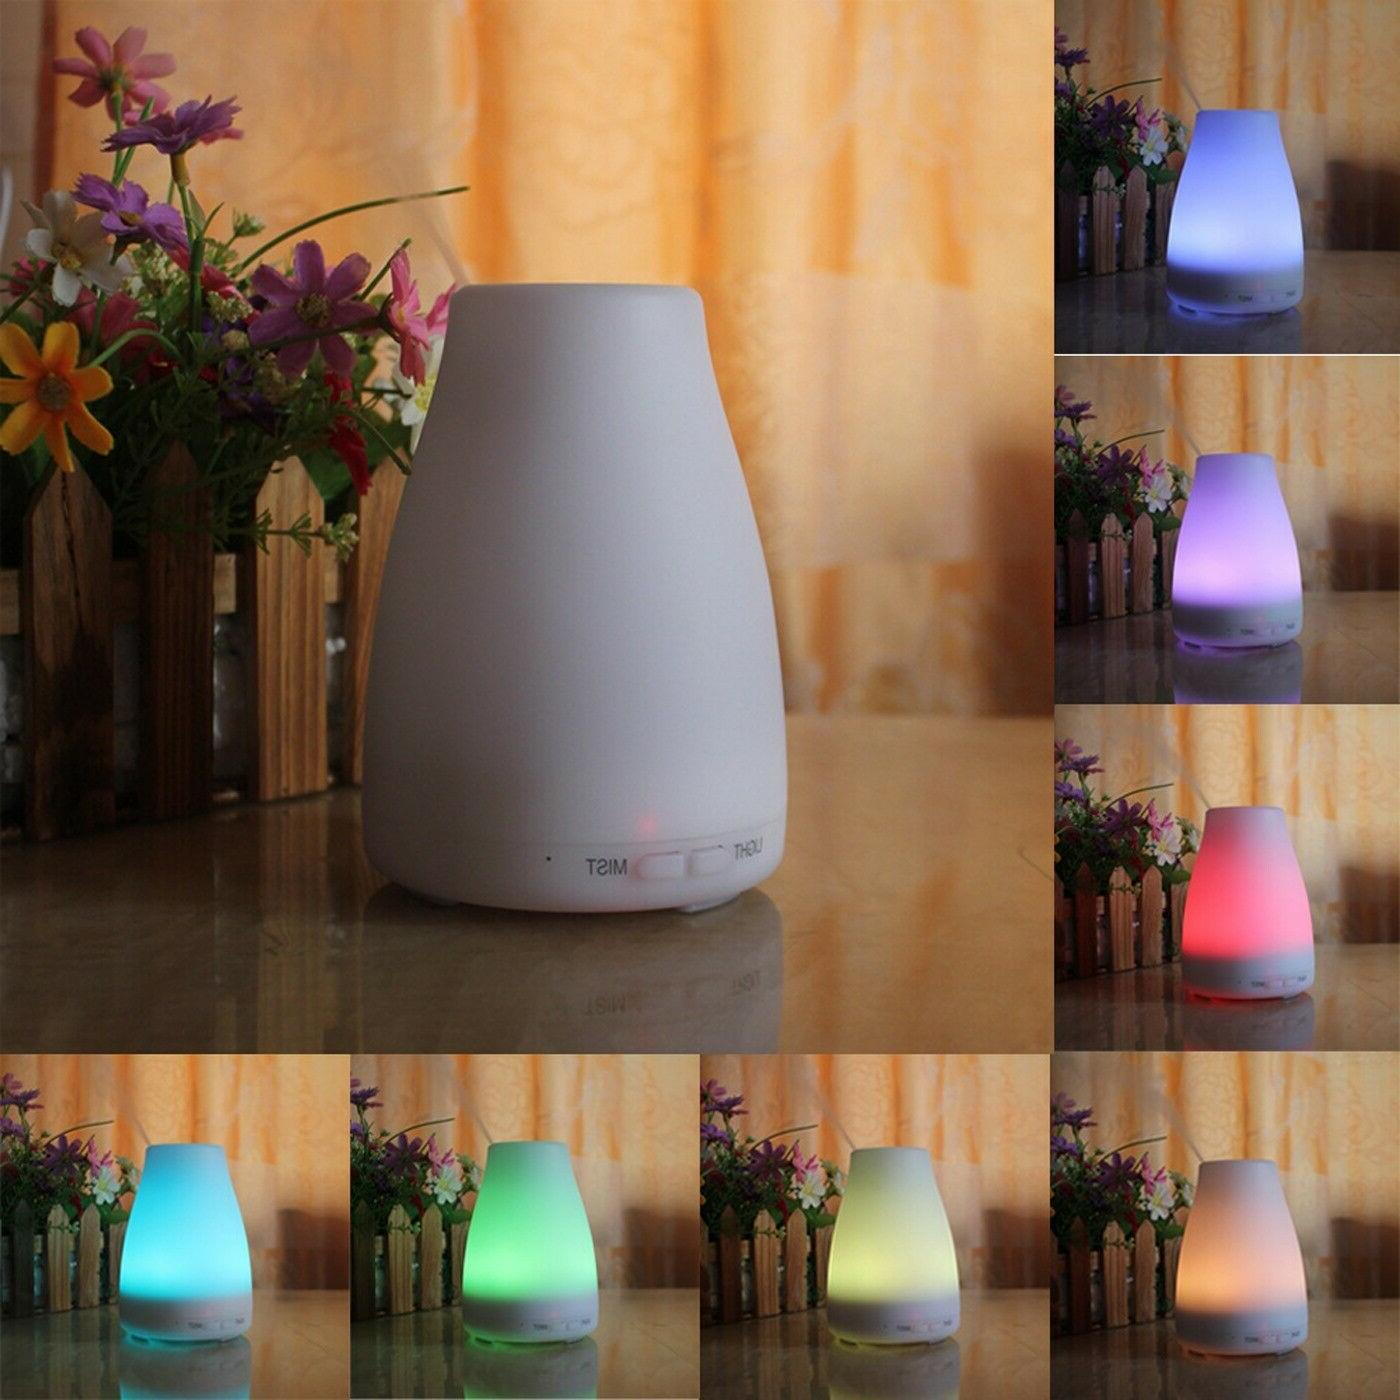 Essential Cool Mist Ultrasonic 7-Color LED